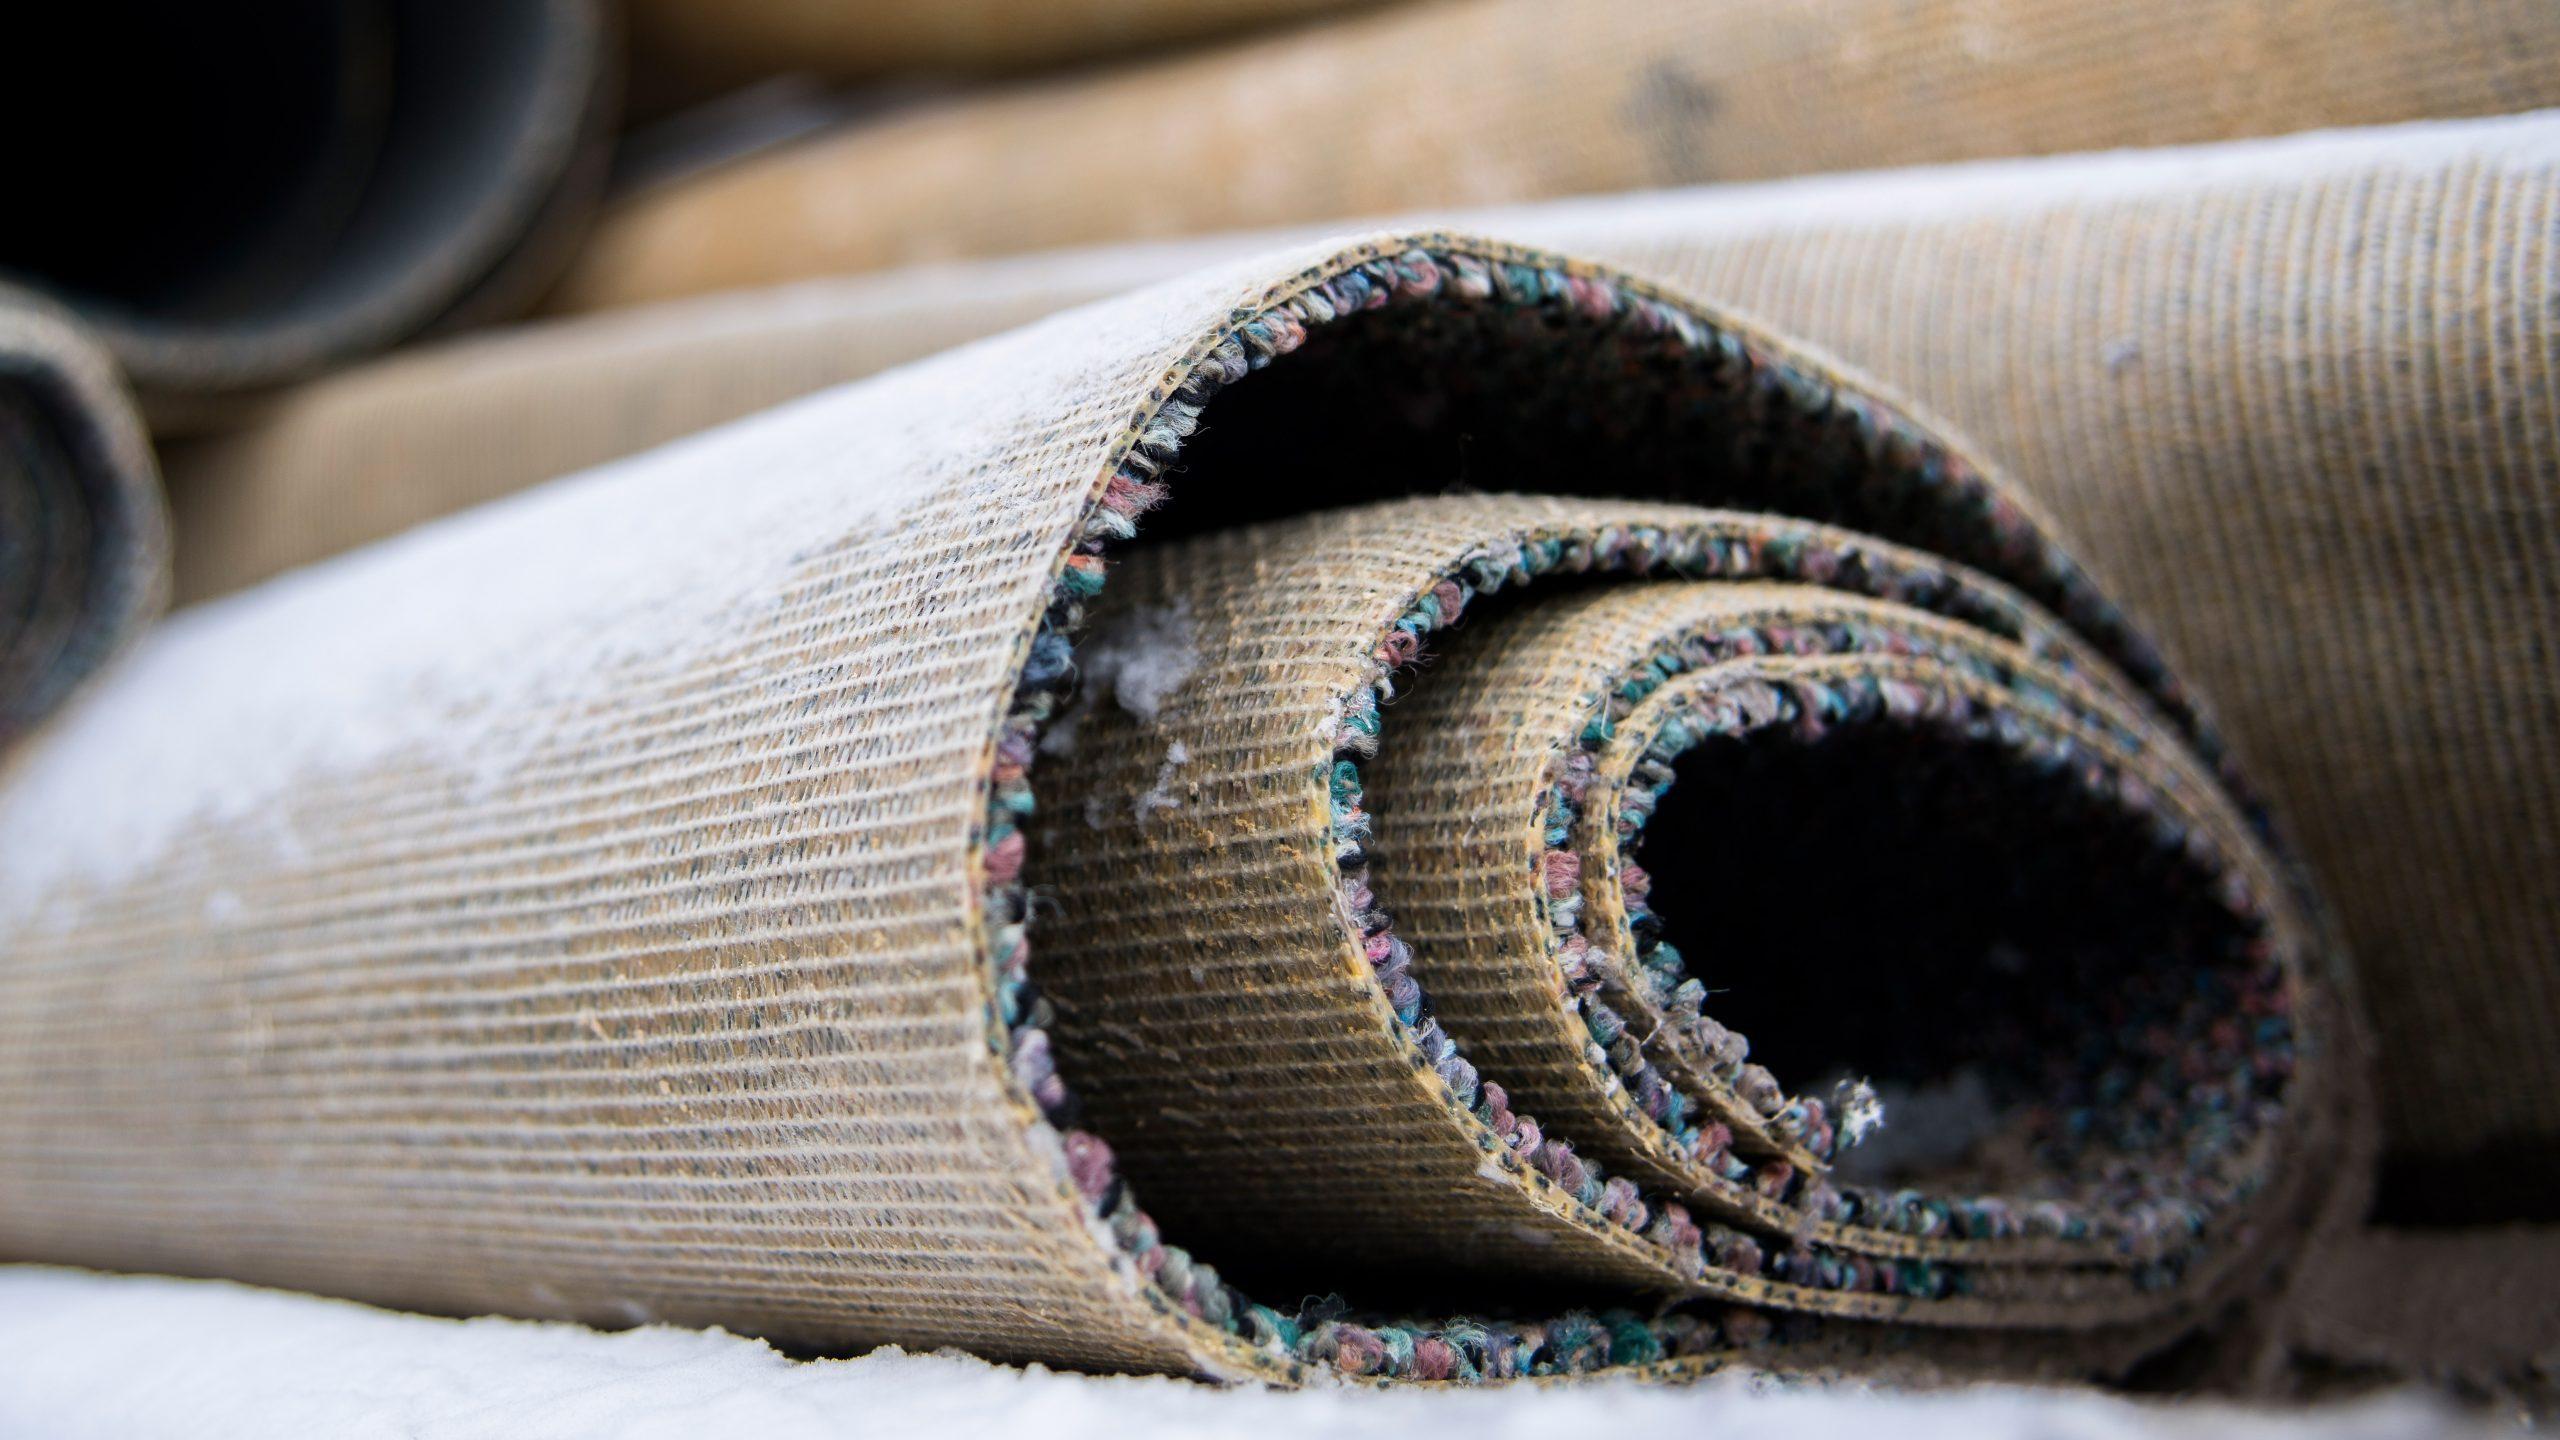 carpet scraps rolled up